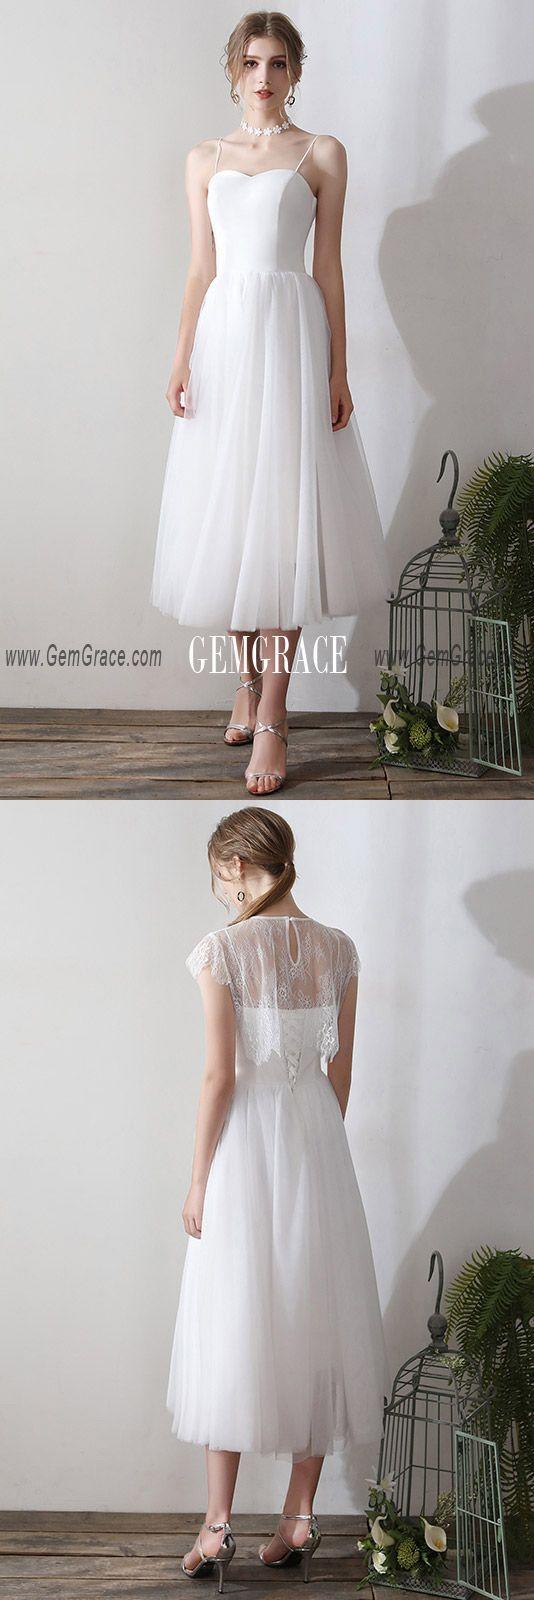 128 90 Vintage Tea Length Tulle Wedding Dress With Lace Top Ys609 Gemgrace Com Simple Lace Dress Tulle Wedding Dress Simple Wedding Dress Short [ 1600 x 534 Pixel ]